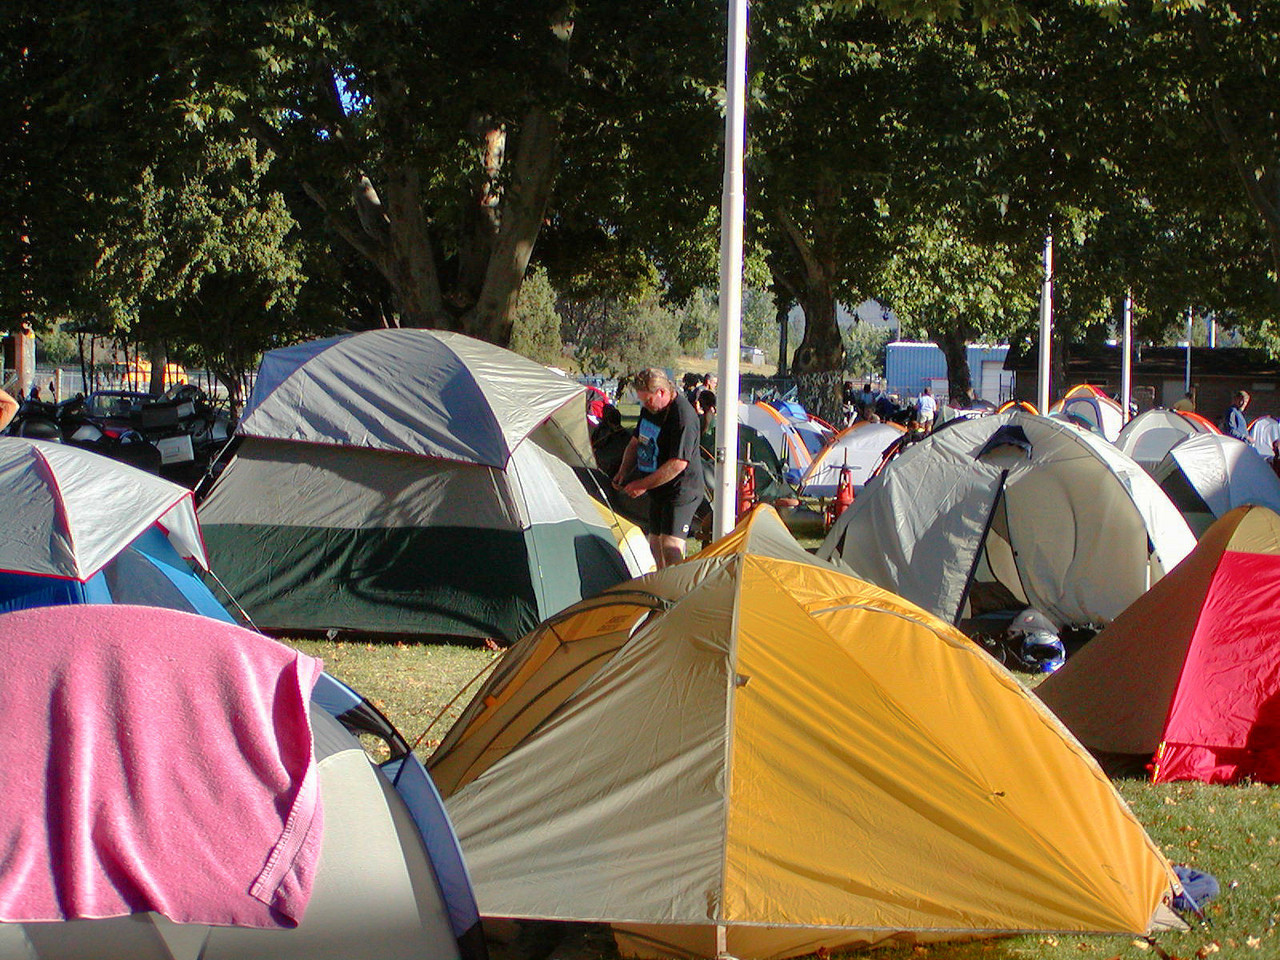 Sea of tents in Yreka